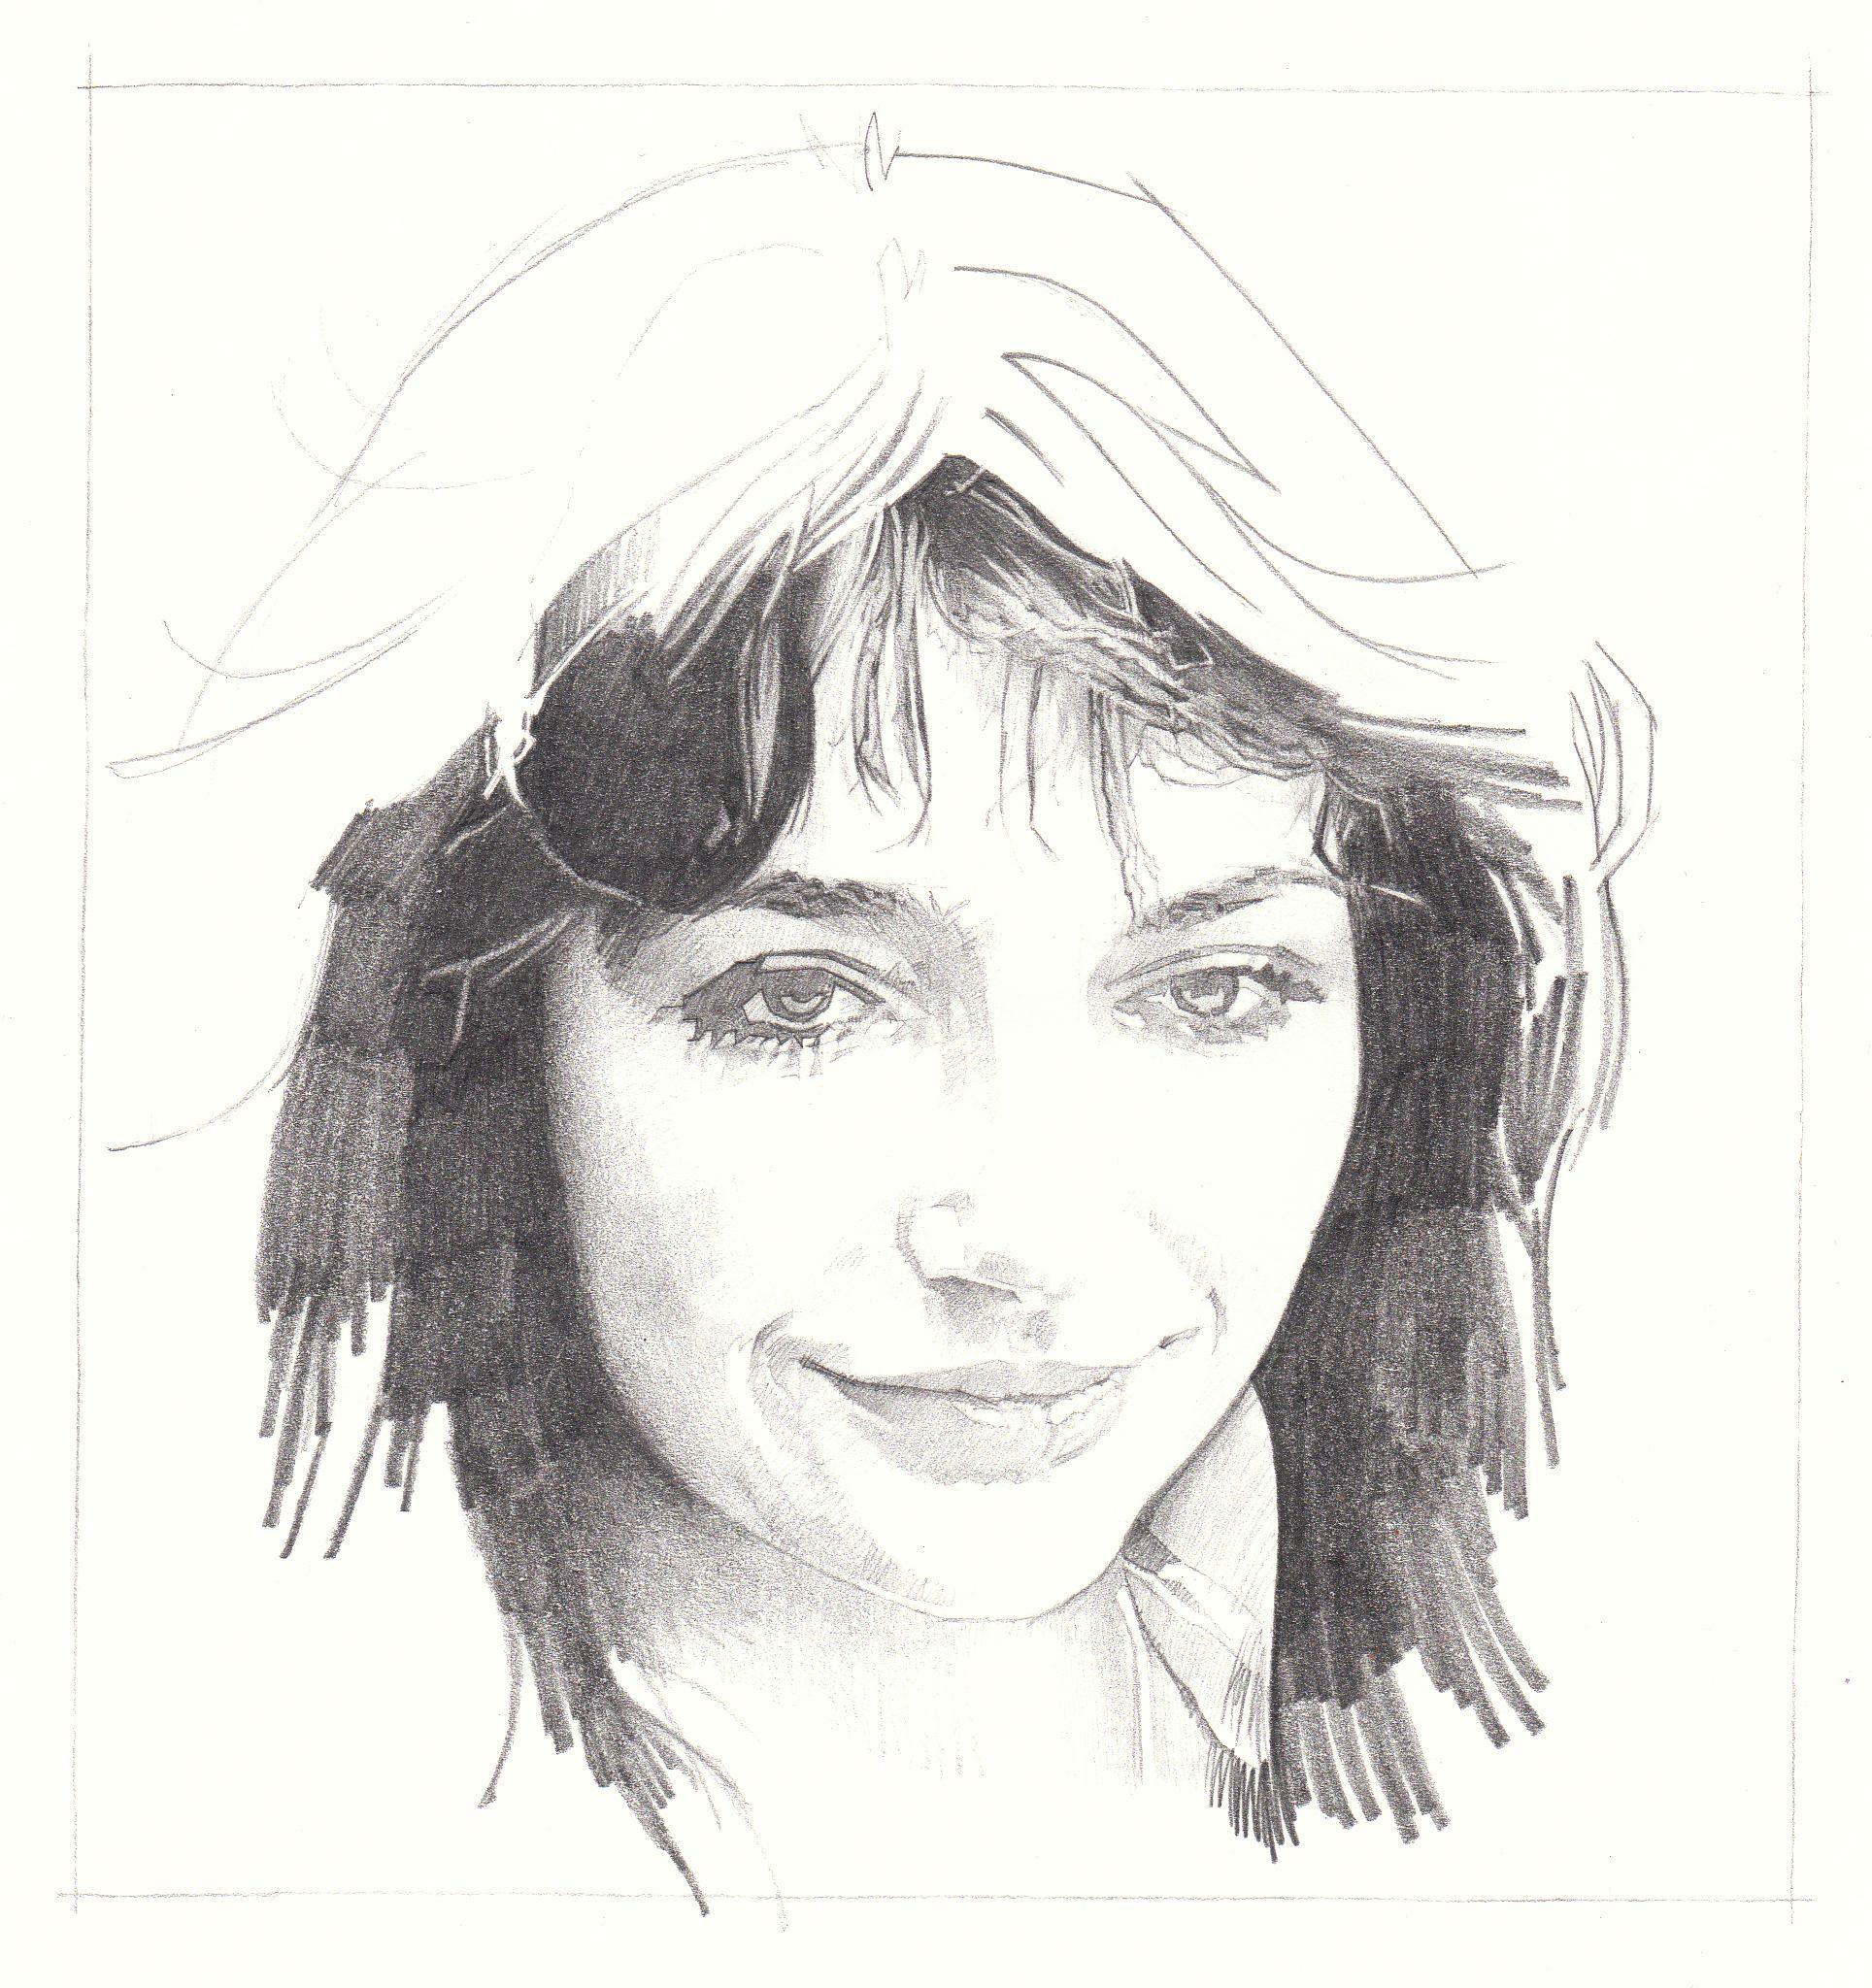 Kate Bush portrait by Gary Mills, pencil & graphite on Bristol board